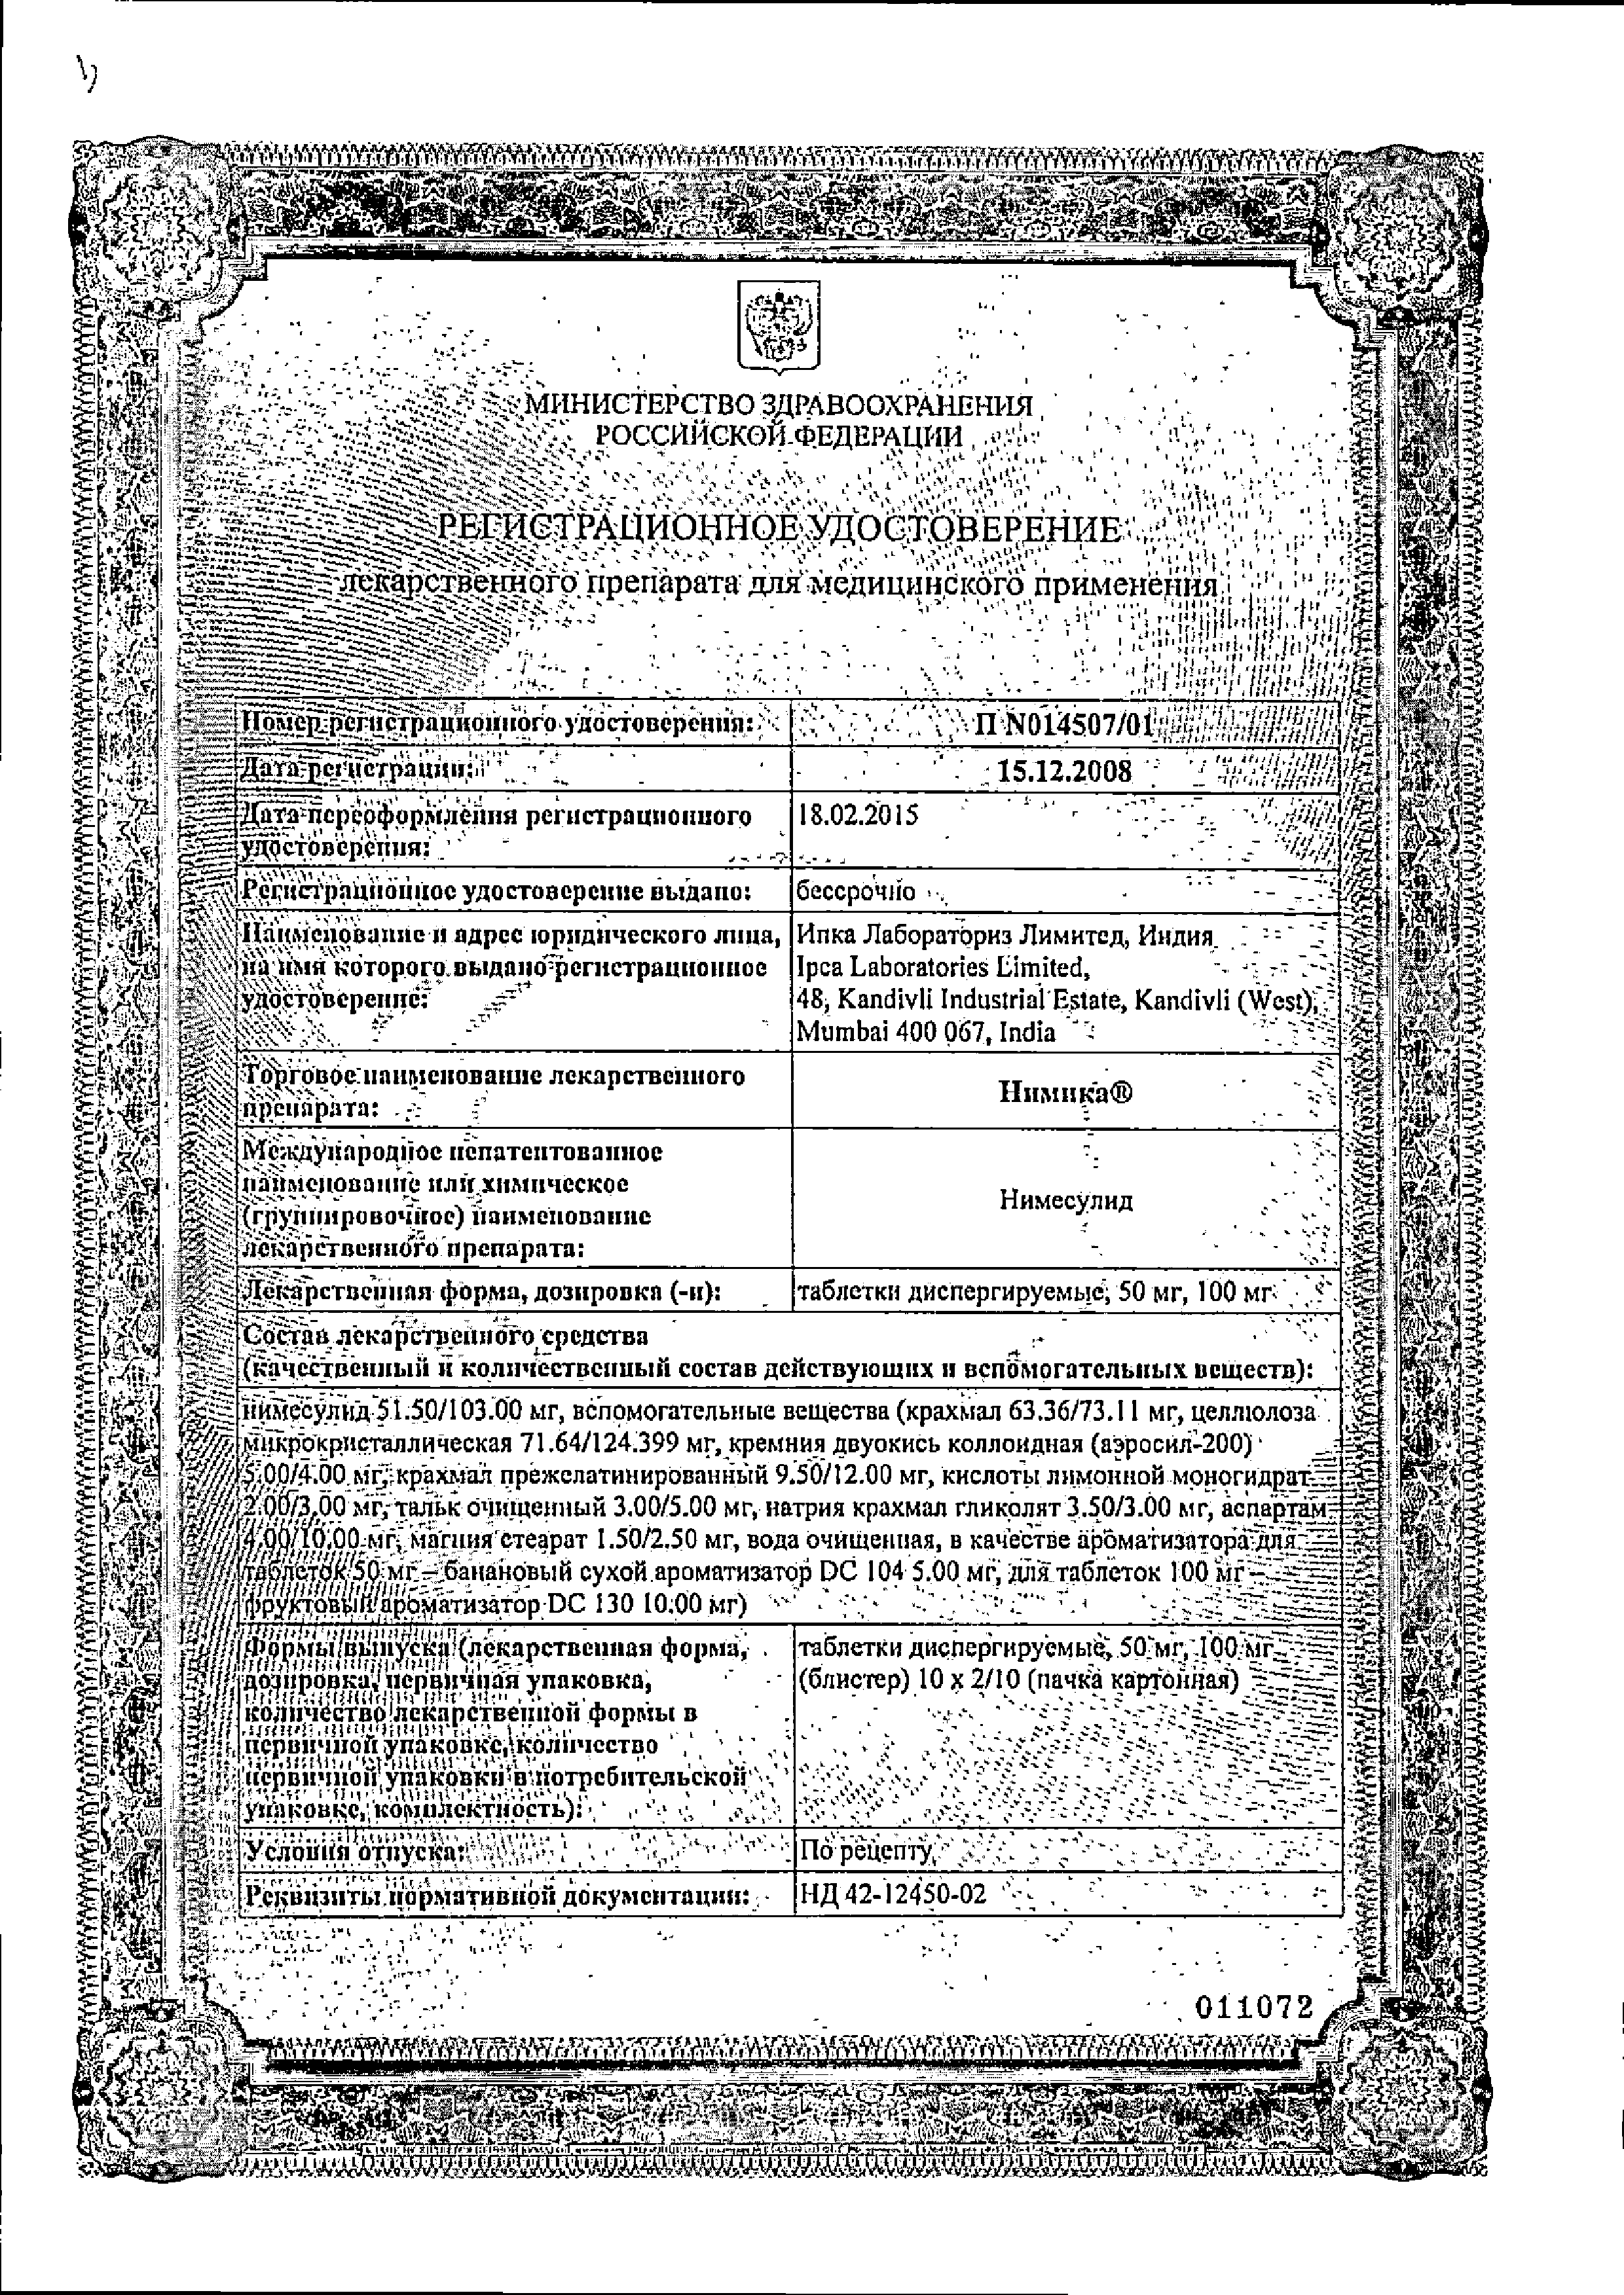 Нимика сертификат